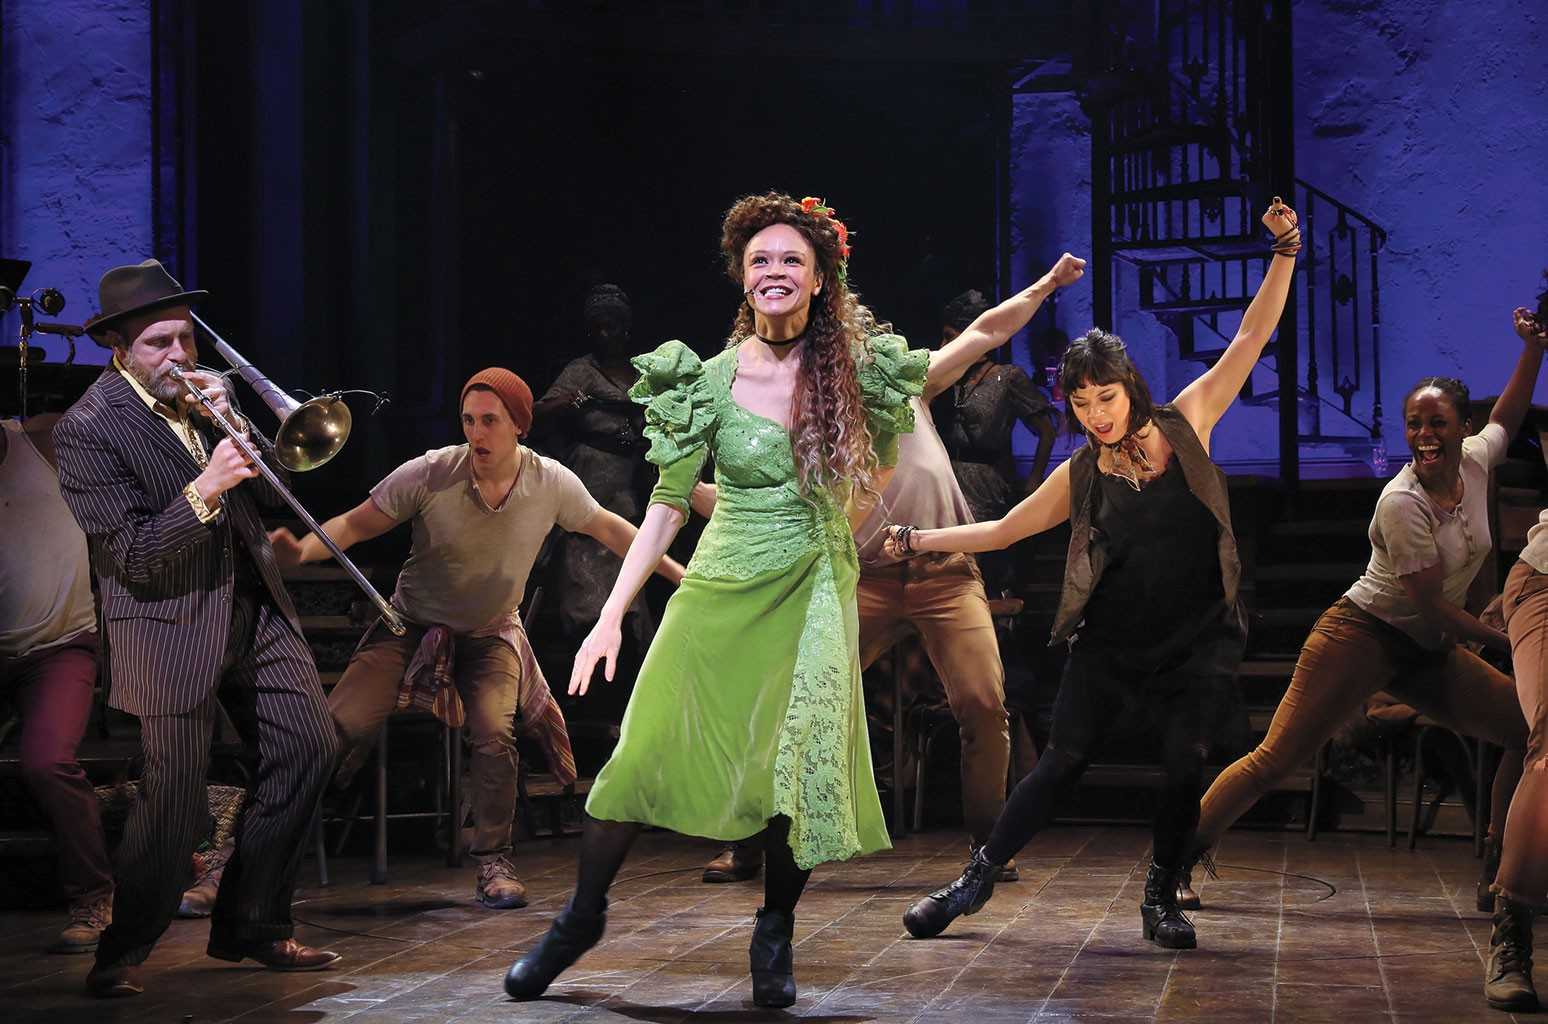 Gray as Persephone in Hadestown.